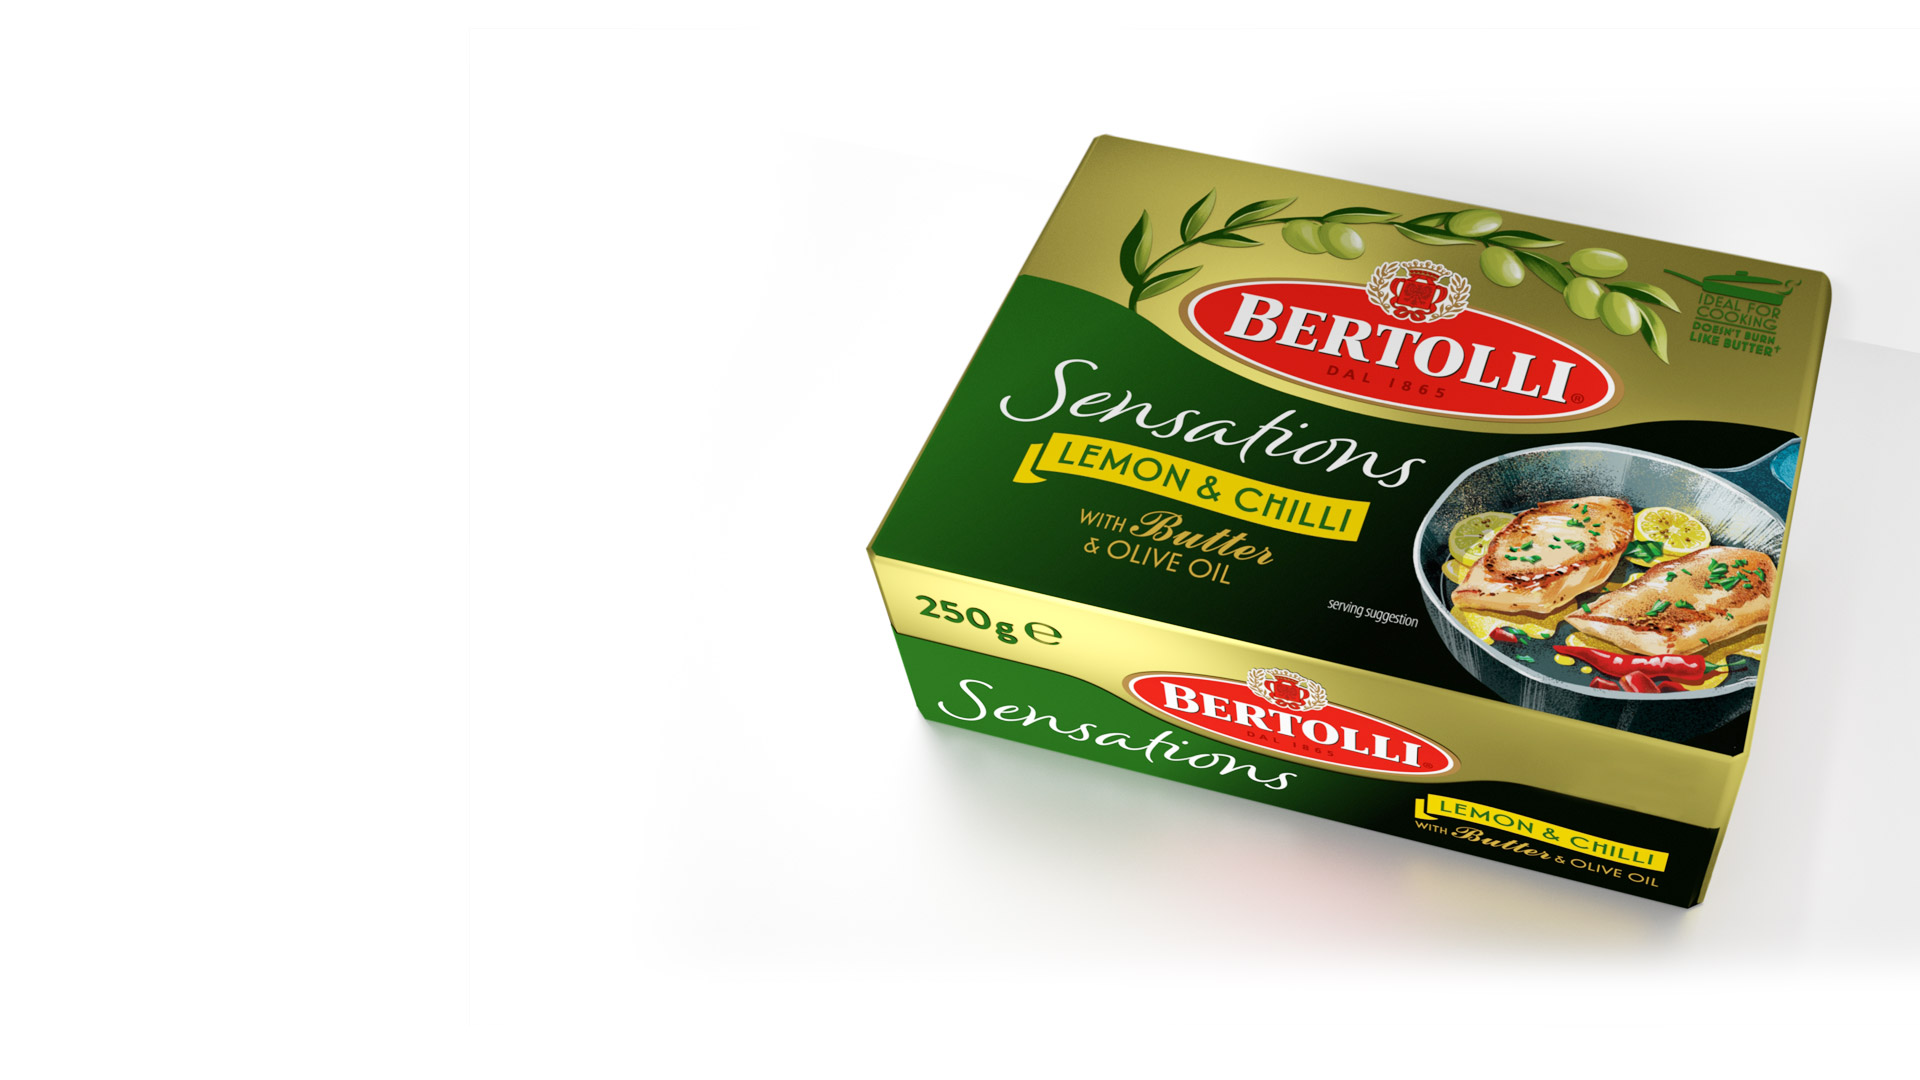 Bertolli Sensations packaging design by Slice